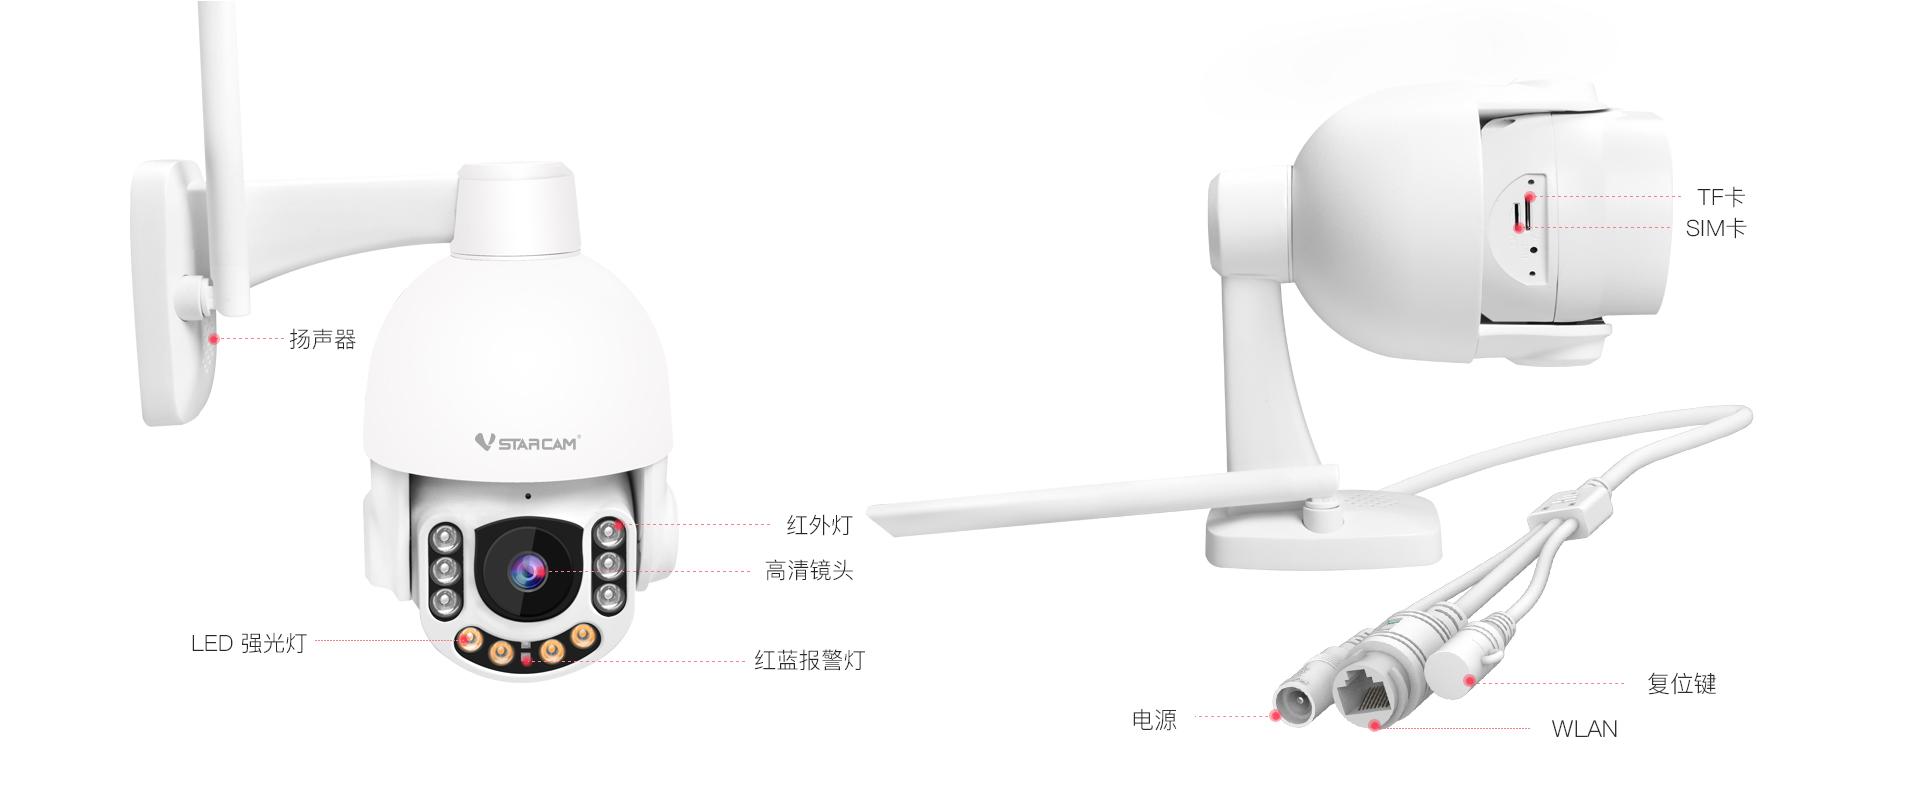 4G监控摄像头